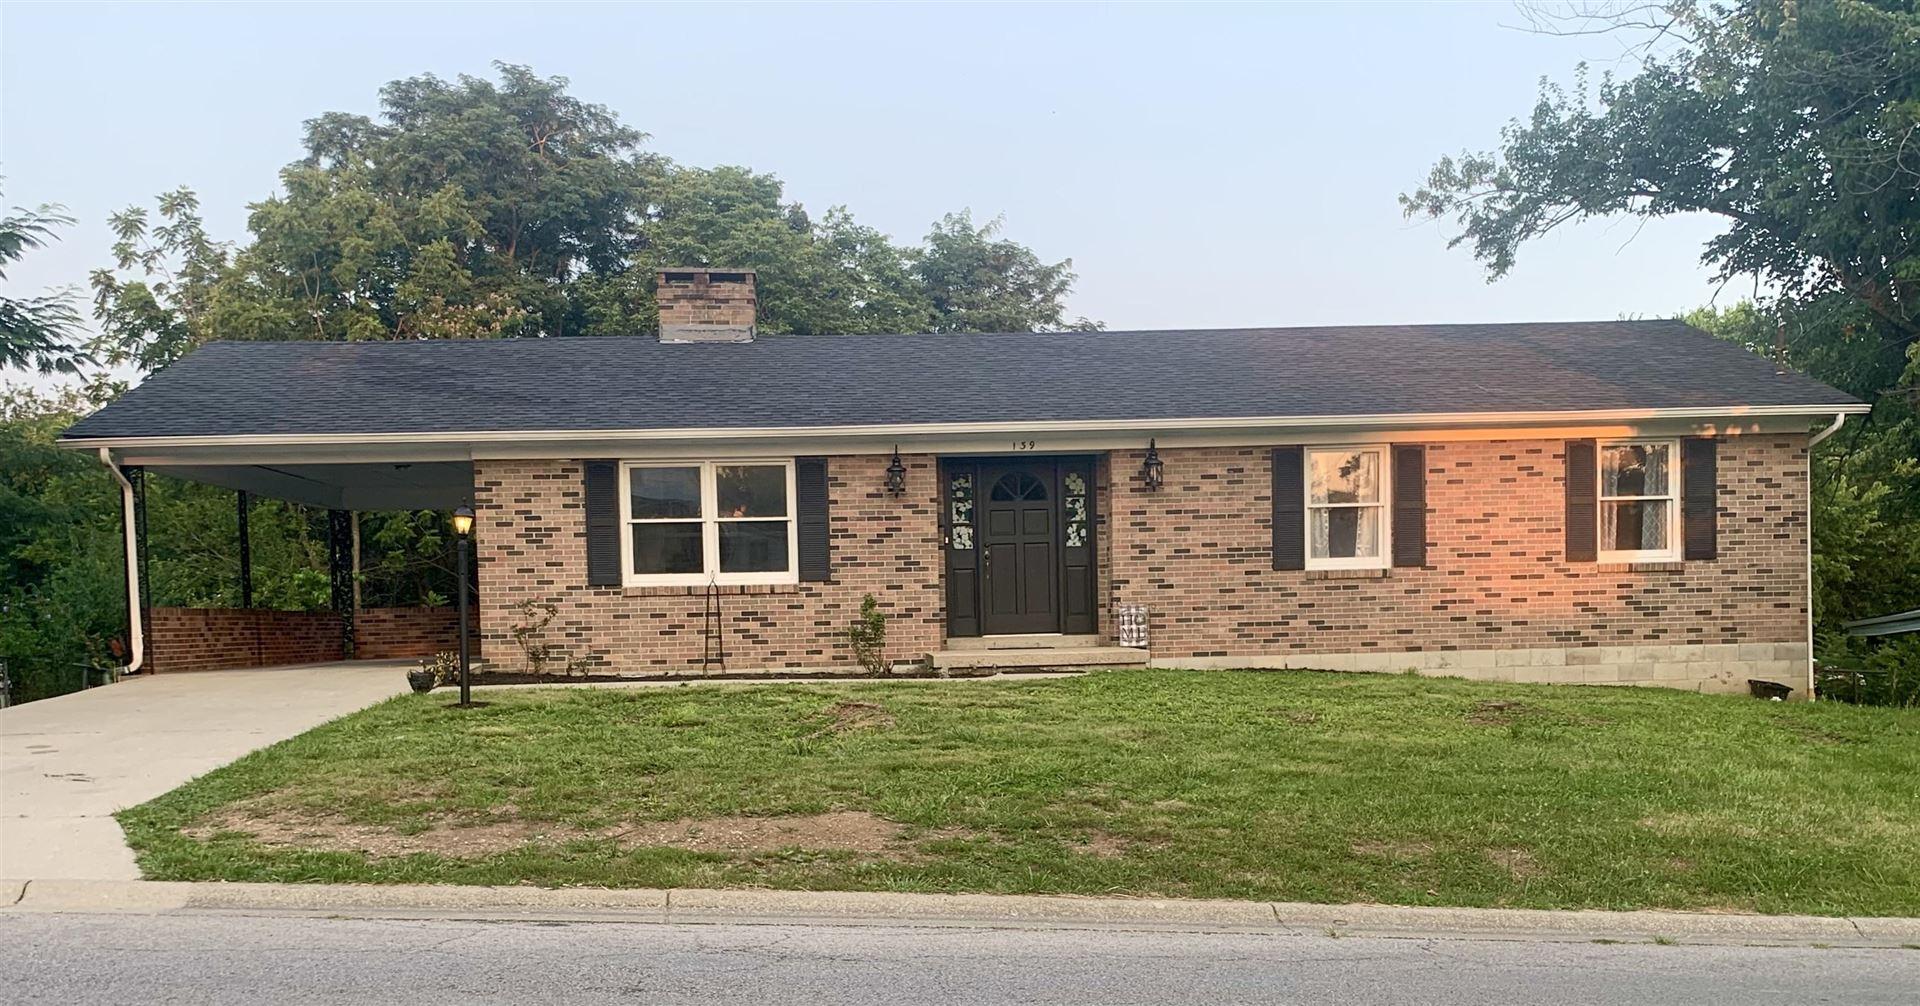 139 Boggs, Richmond, KY 40475 - MLS#: 20114727